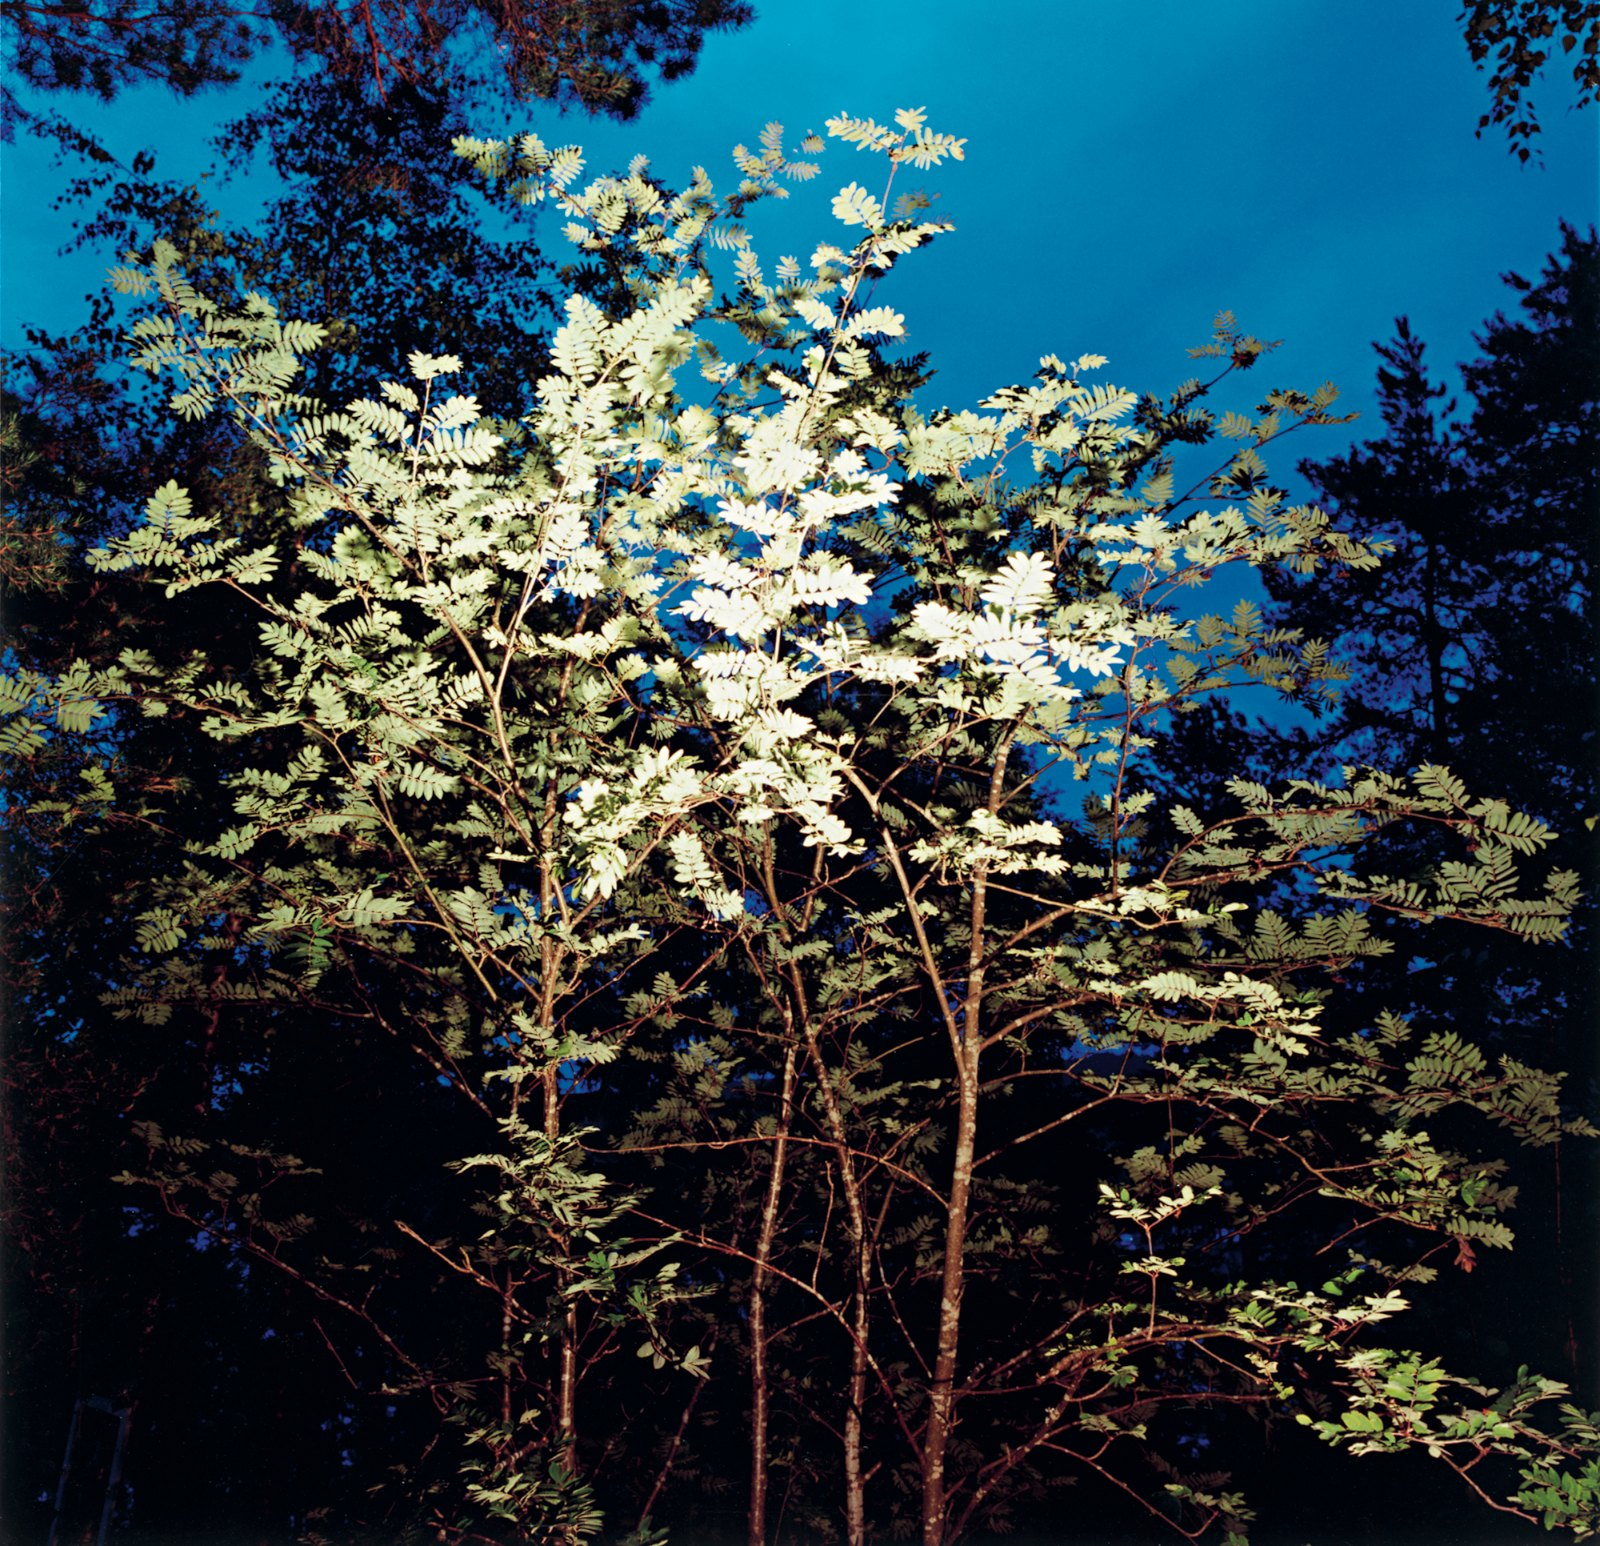 Night Lamp 23:05, 2008, C-print, 120 x 120 cm